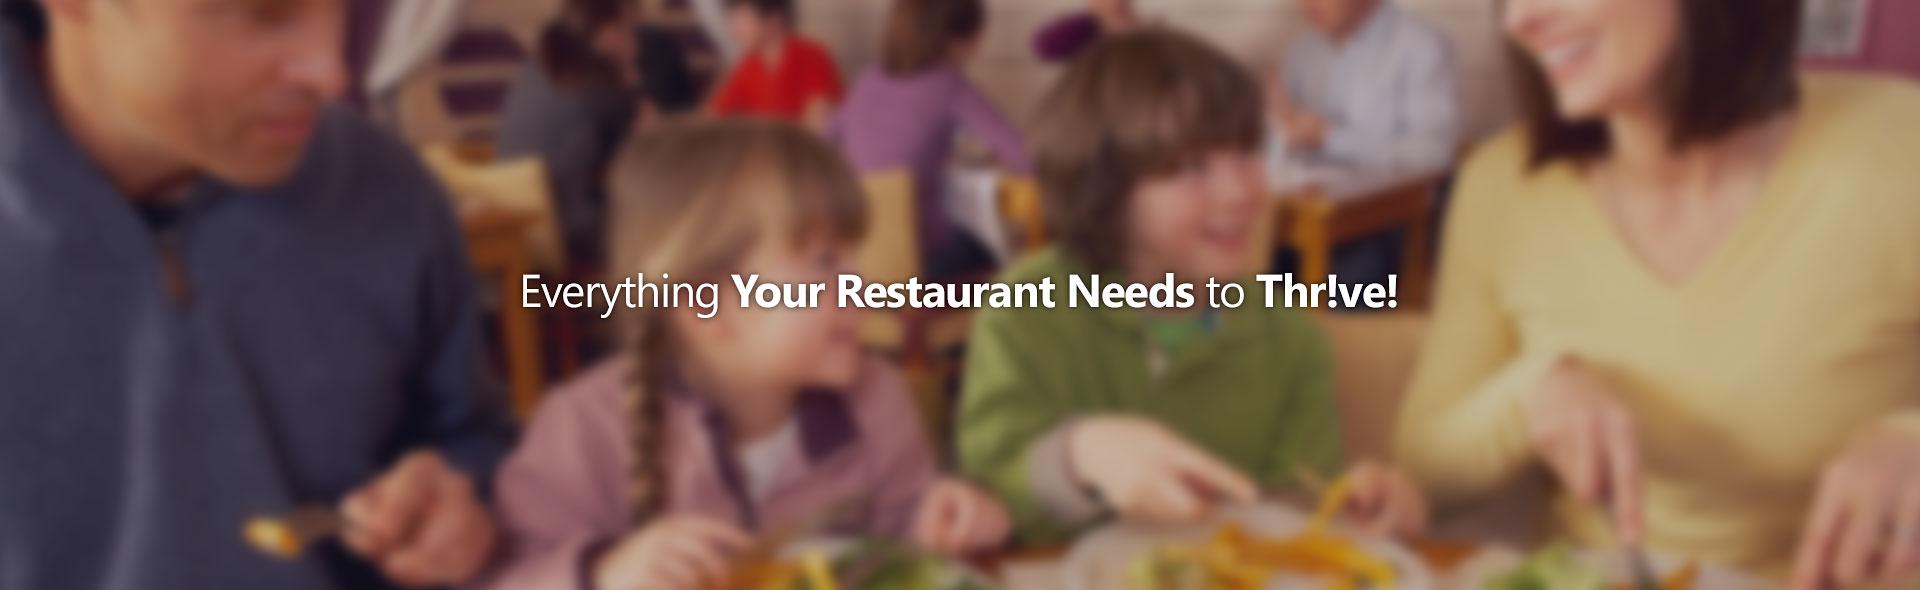 header_blur_restaurant_pos4.jpg